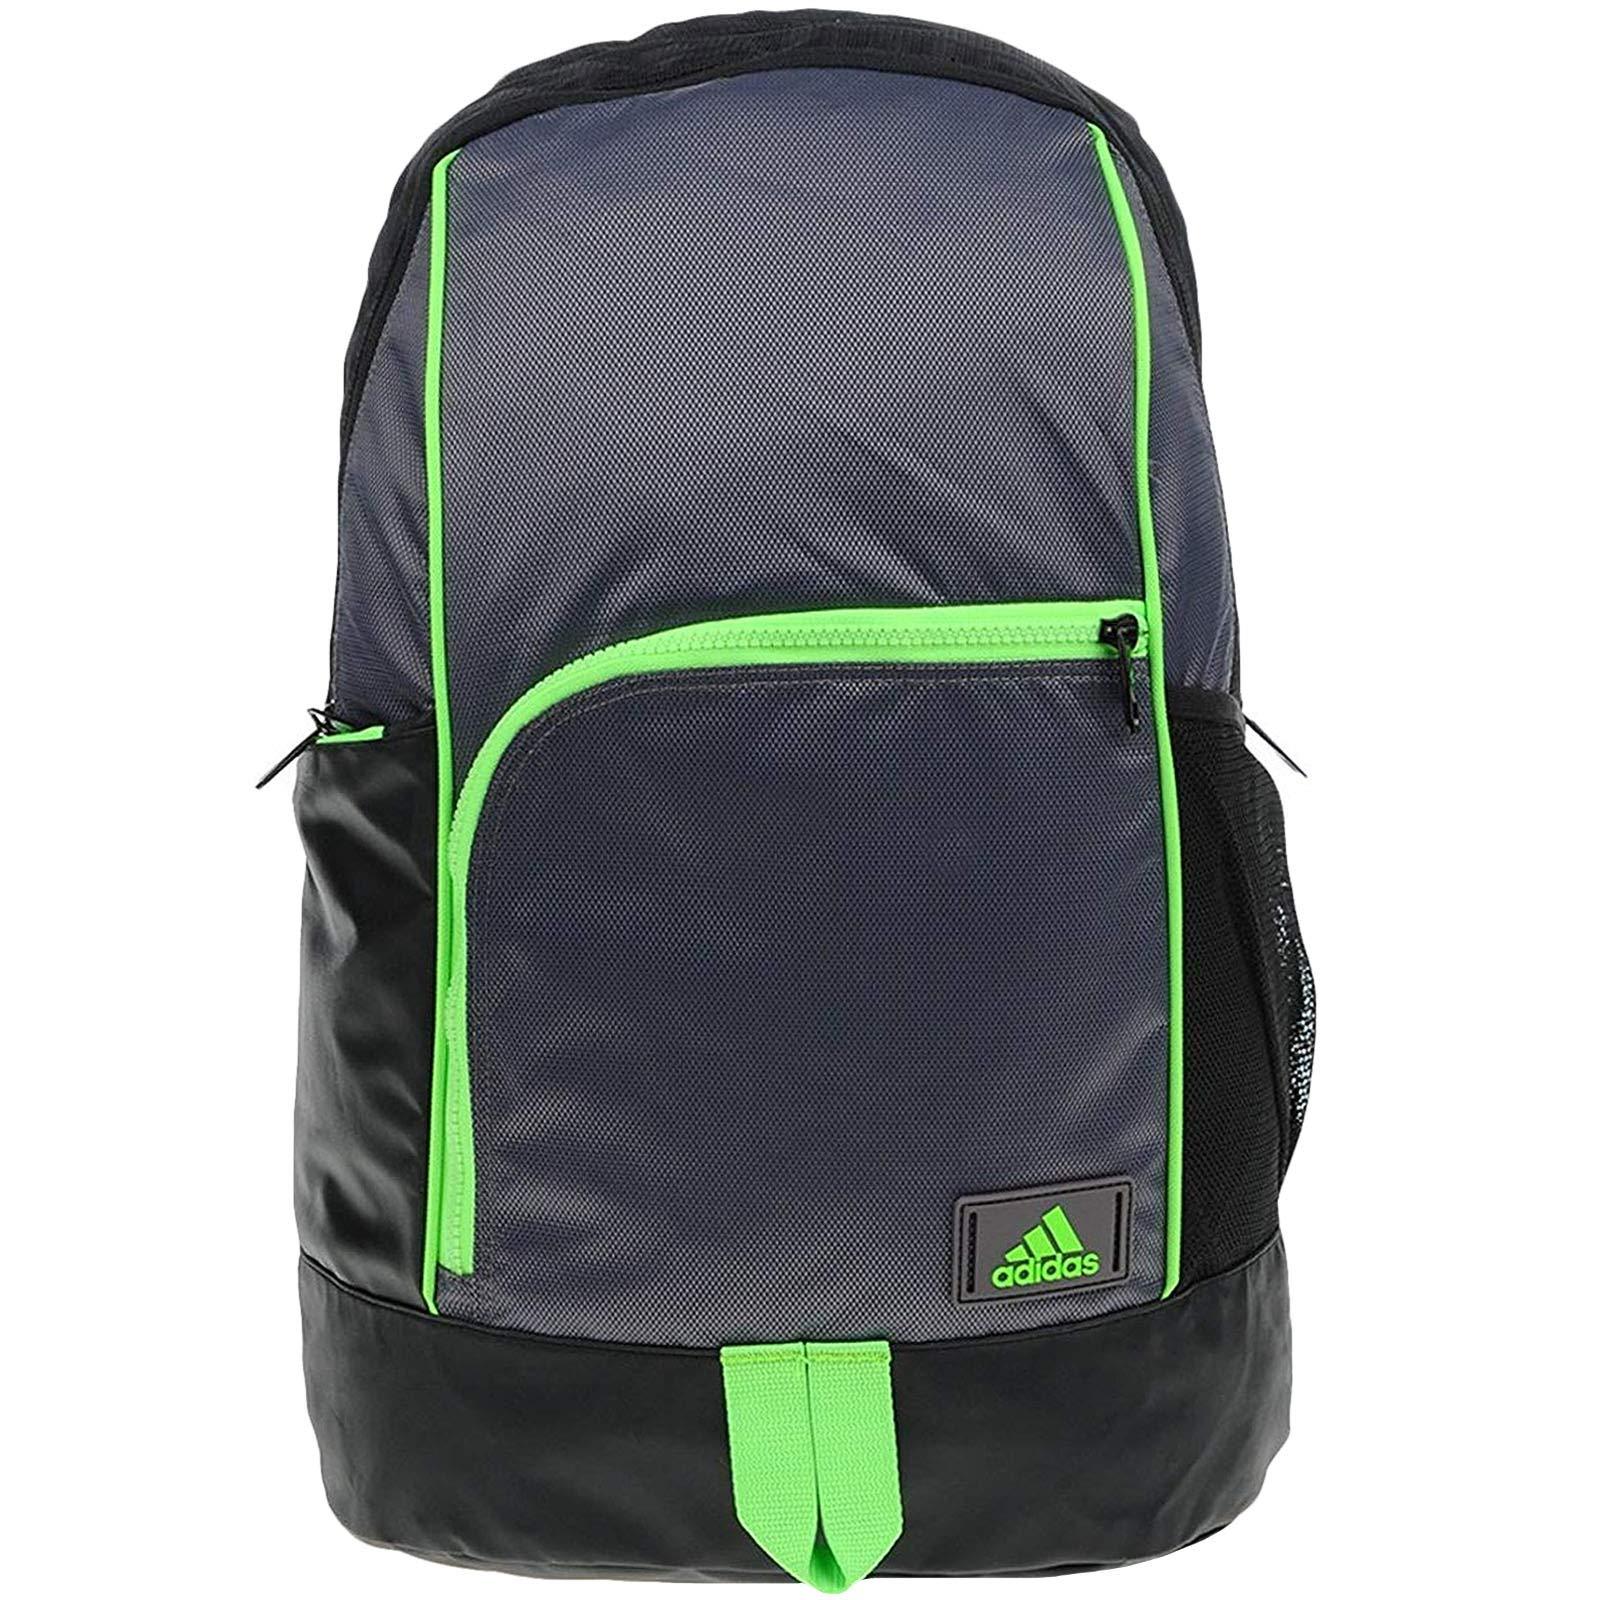 2dc0d0cc867 Adidas NGA 1.0 M Backpack Sport Hiking Training Laptop Reflective Outdoor  Black Grey